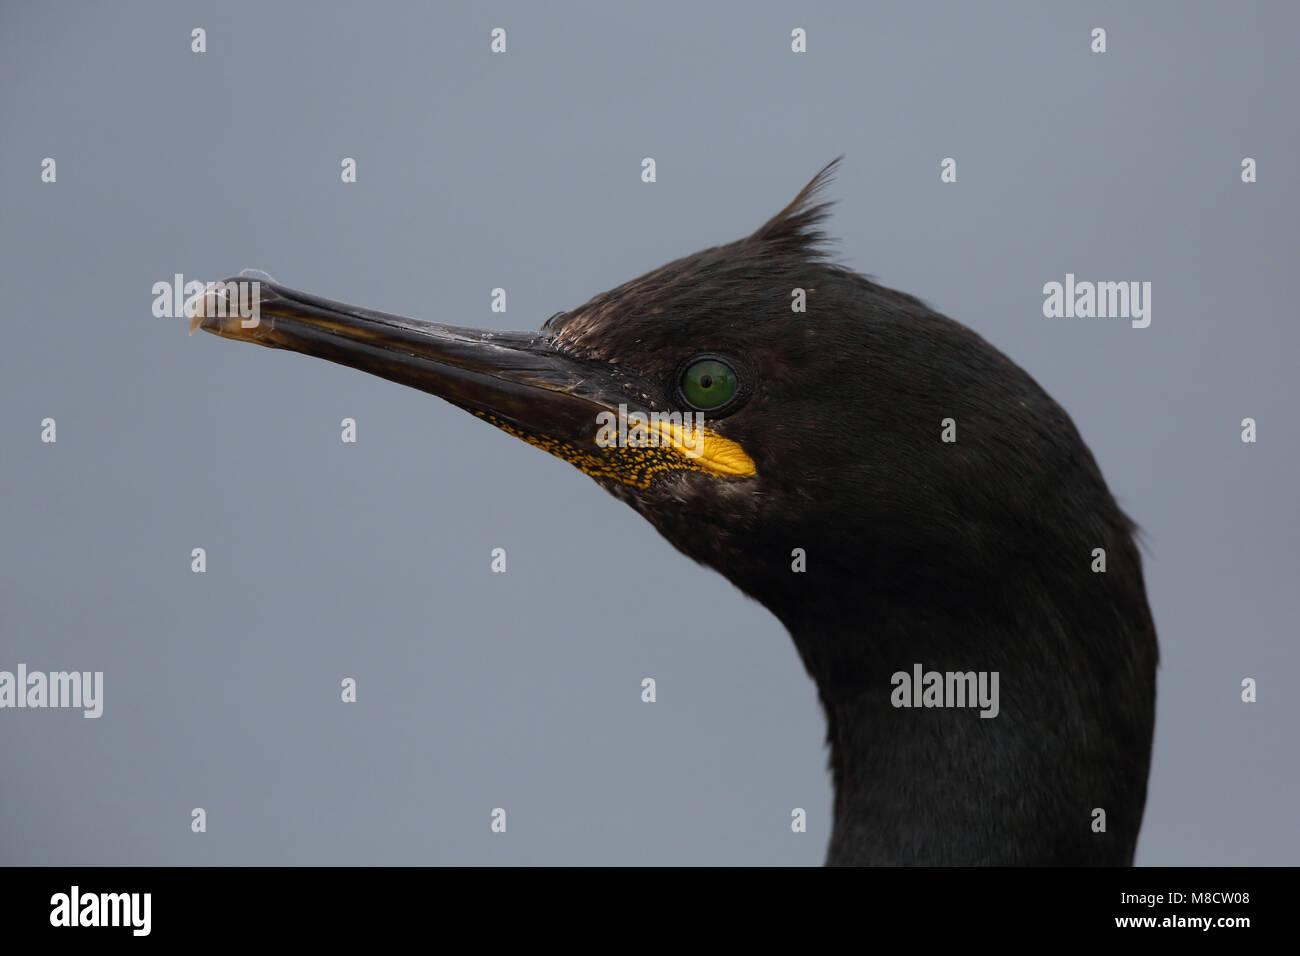 Close up van Kuifaalscholver, Close-up of European Shag - Stock Image